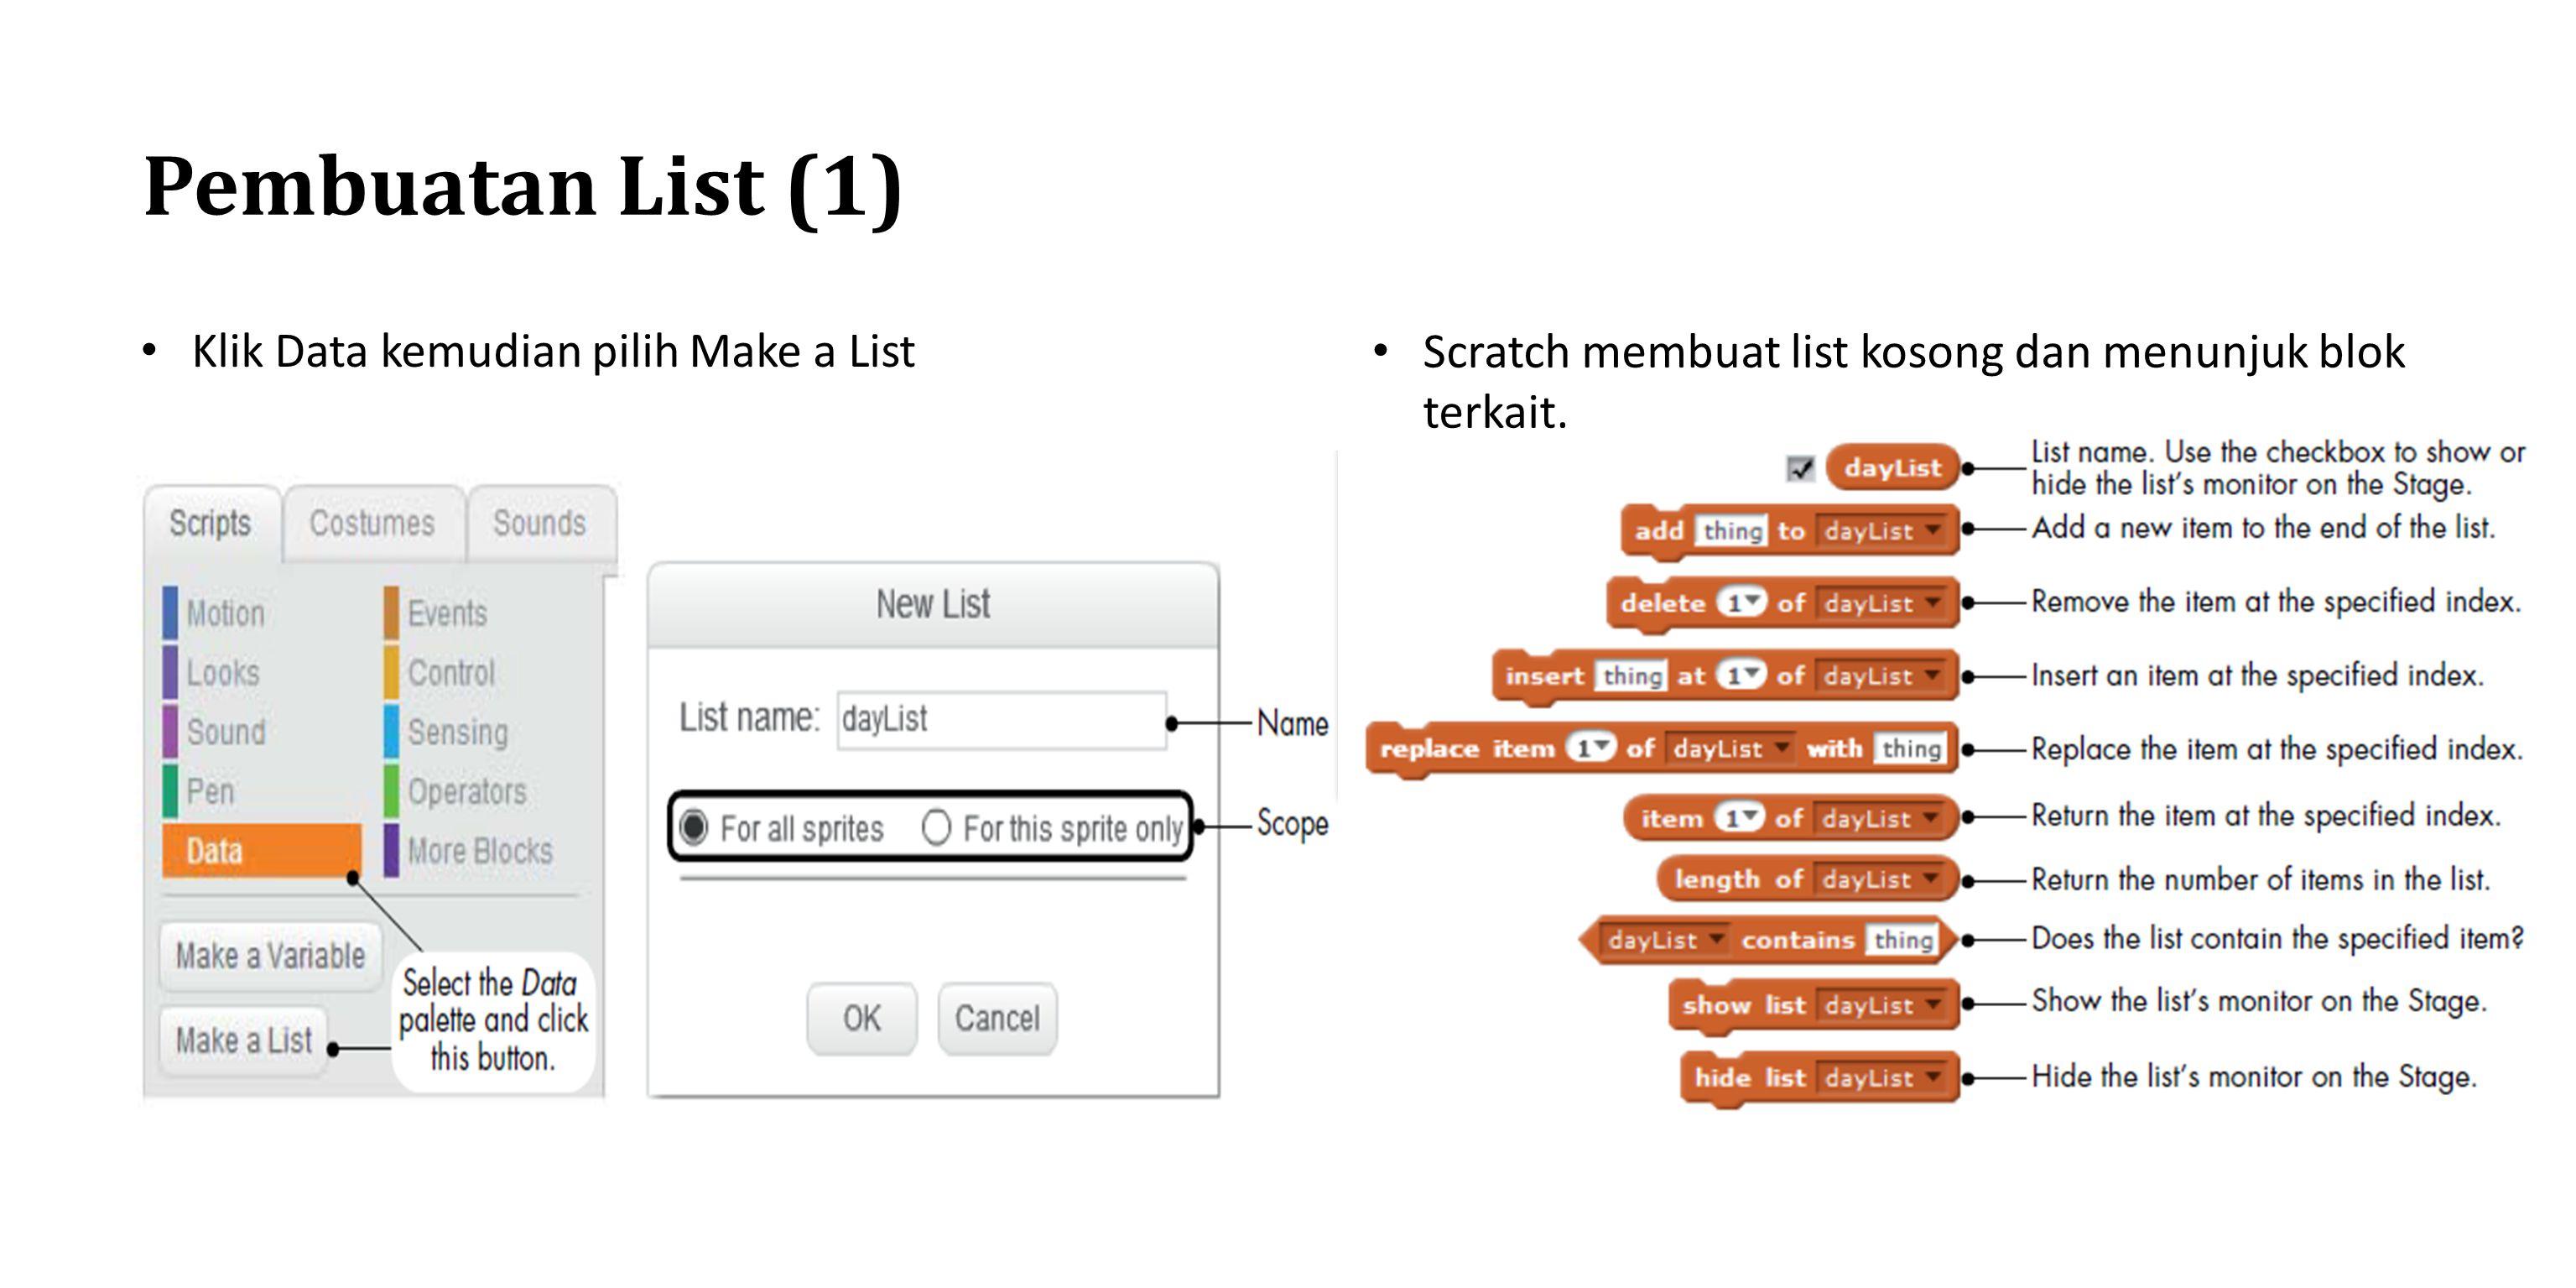 Pembuatan List (1) Klik Data kemudian pilih Make a List